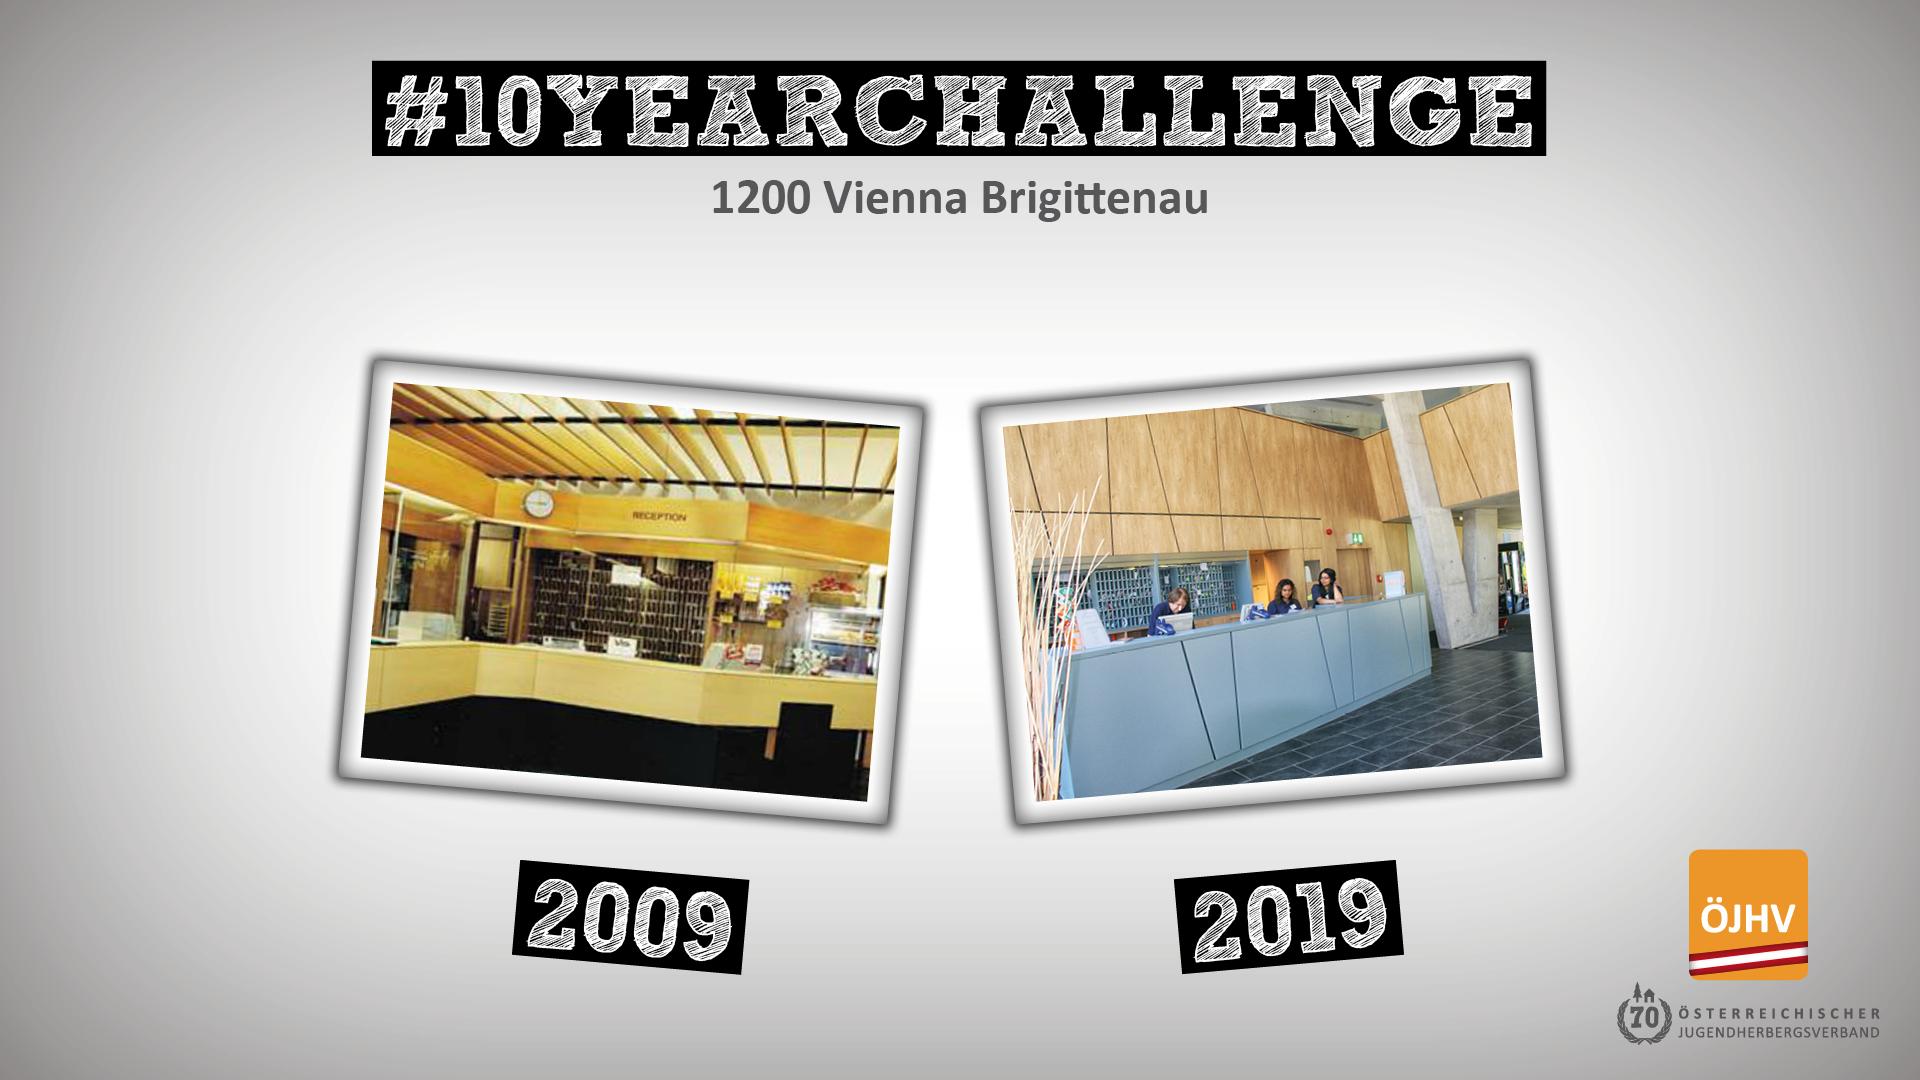 Jugendherbergsverband #10YearChallenge 1200 Vienna Brigittenau